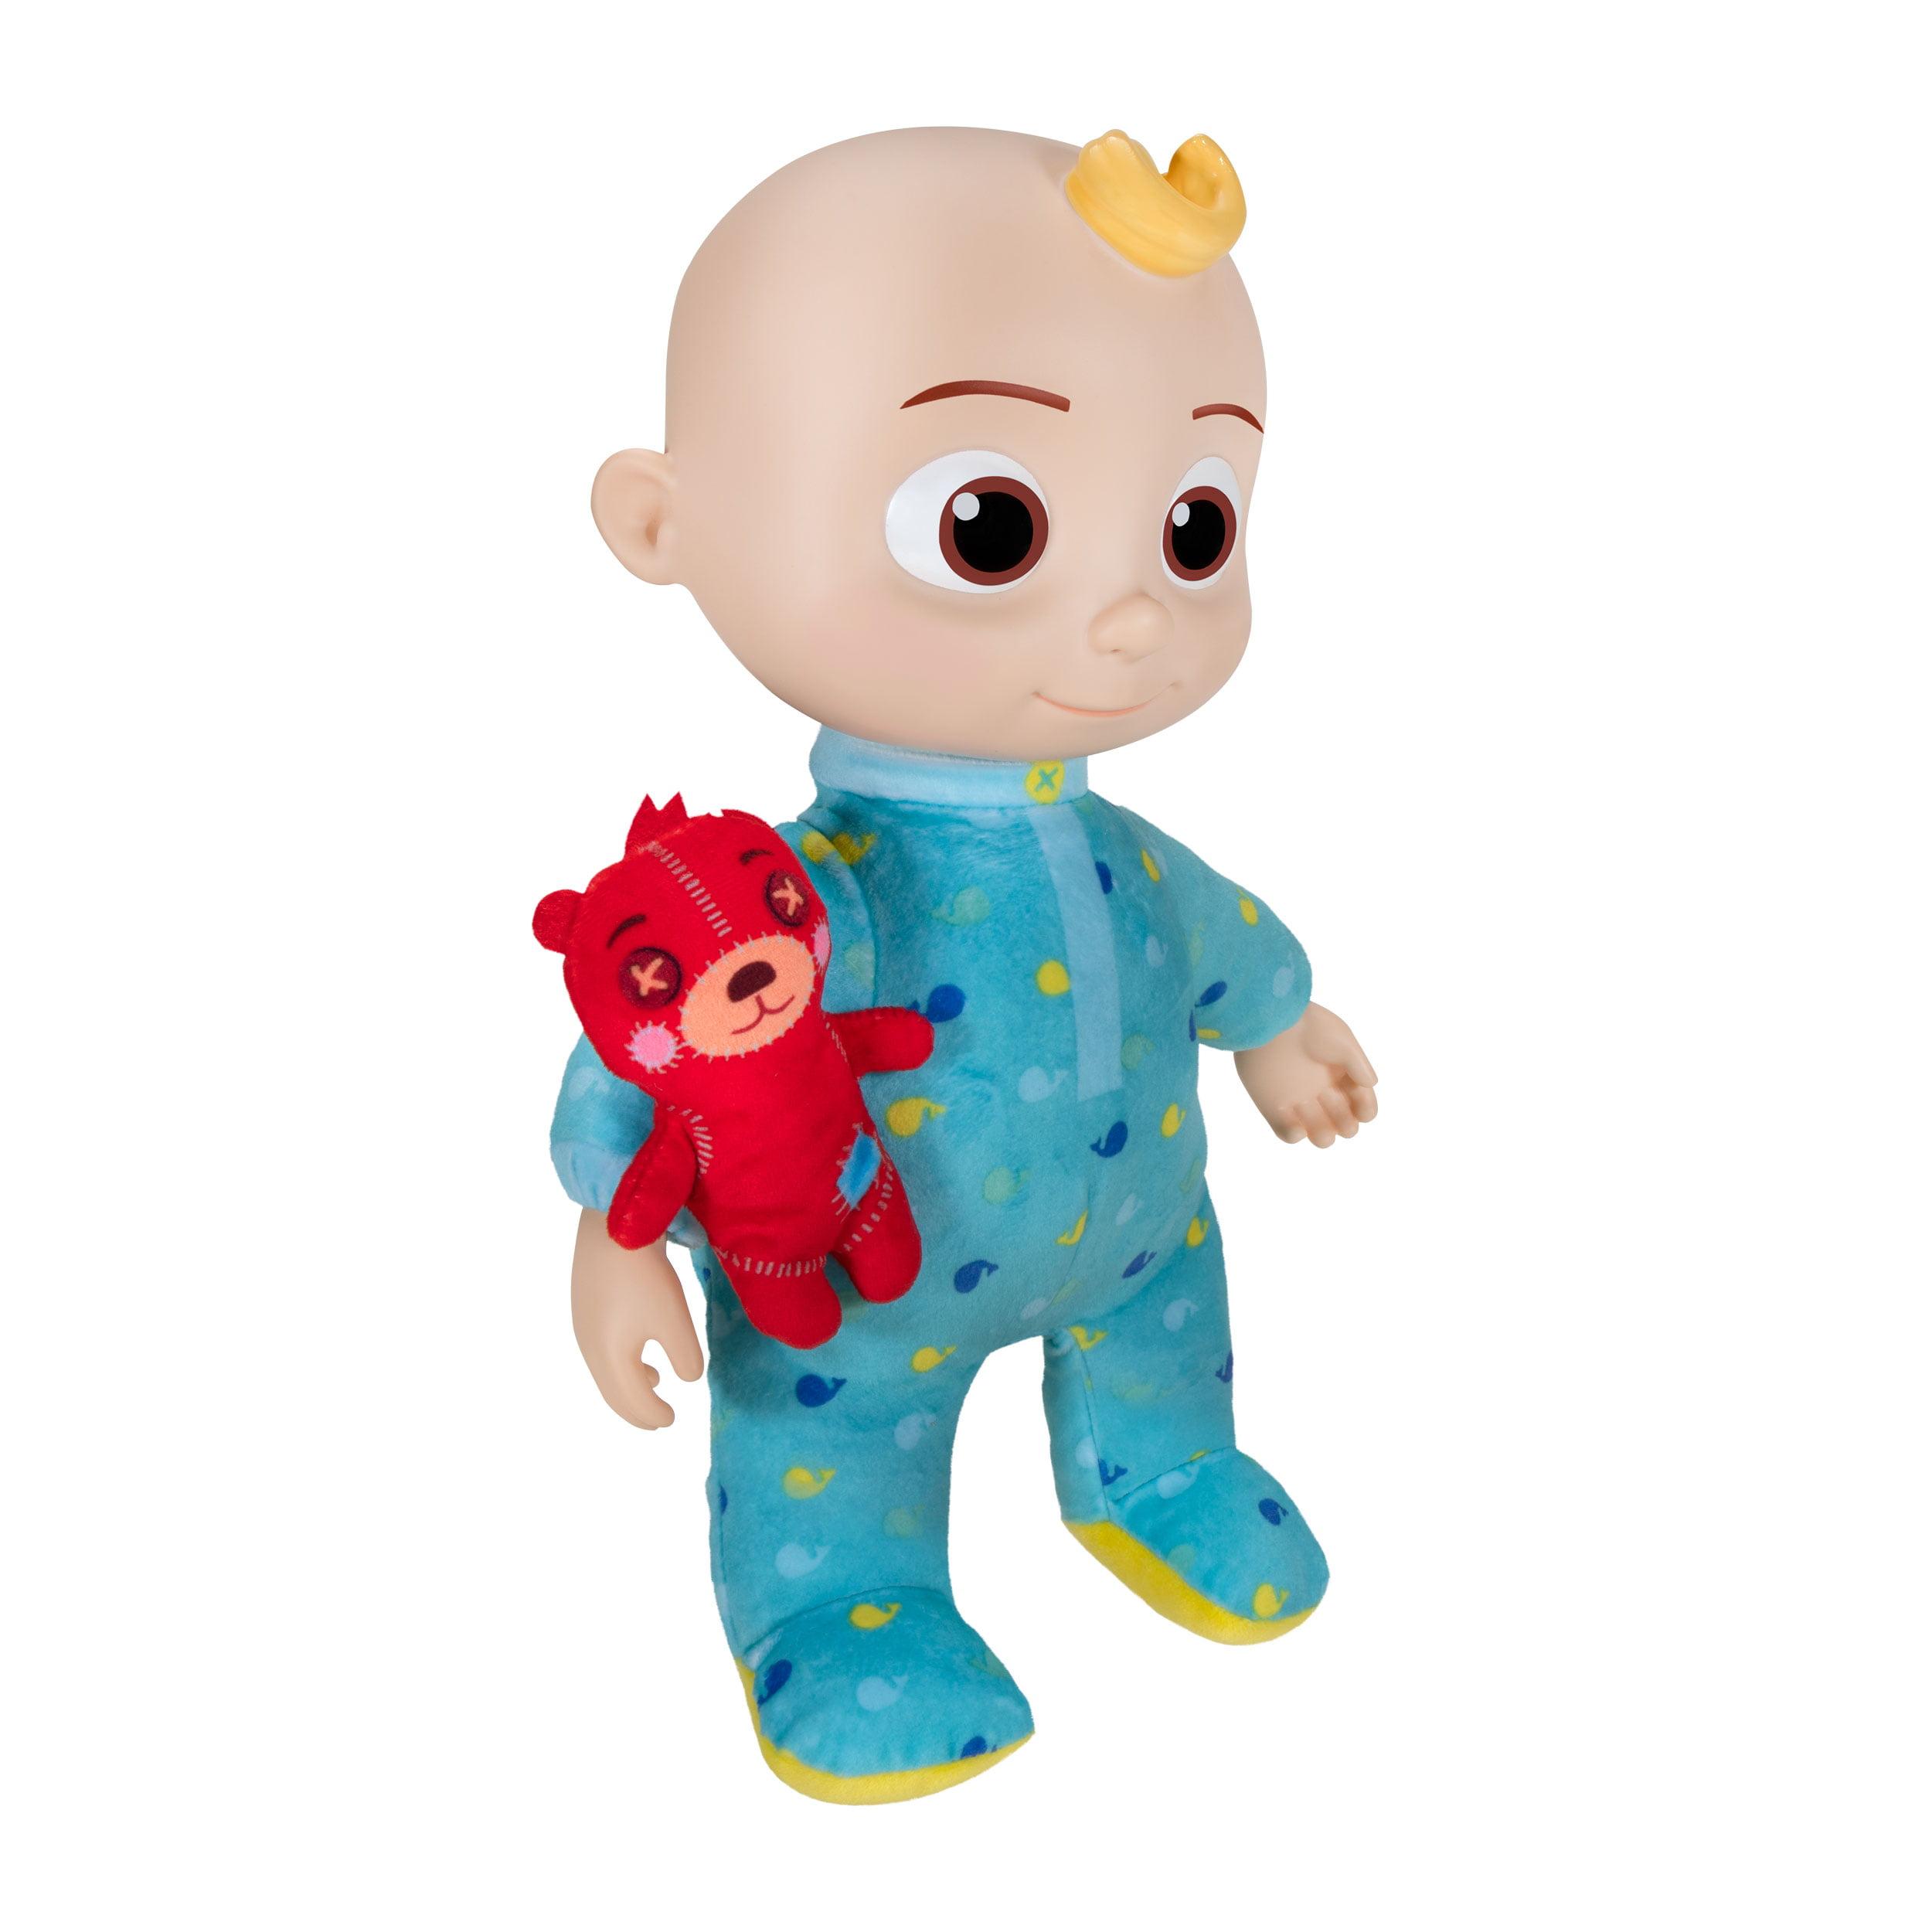 Cocomelon Educational Plush Stuffed Doll cocmelon Toys Kids Xmas Gifts